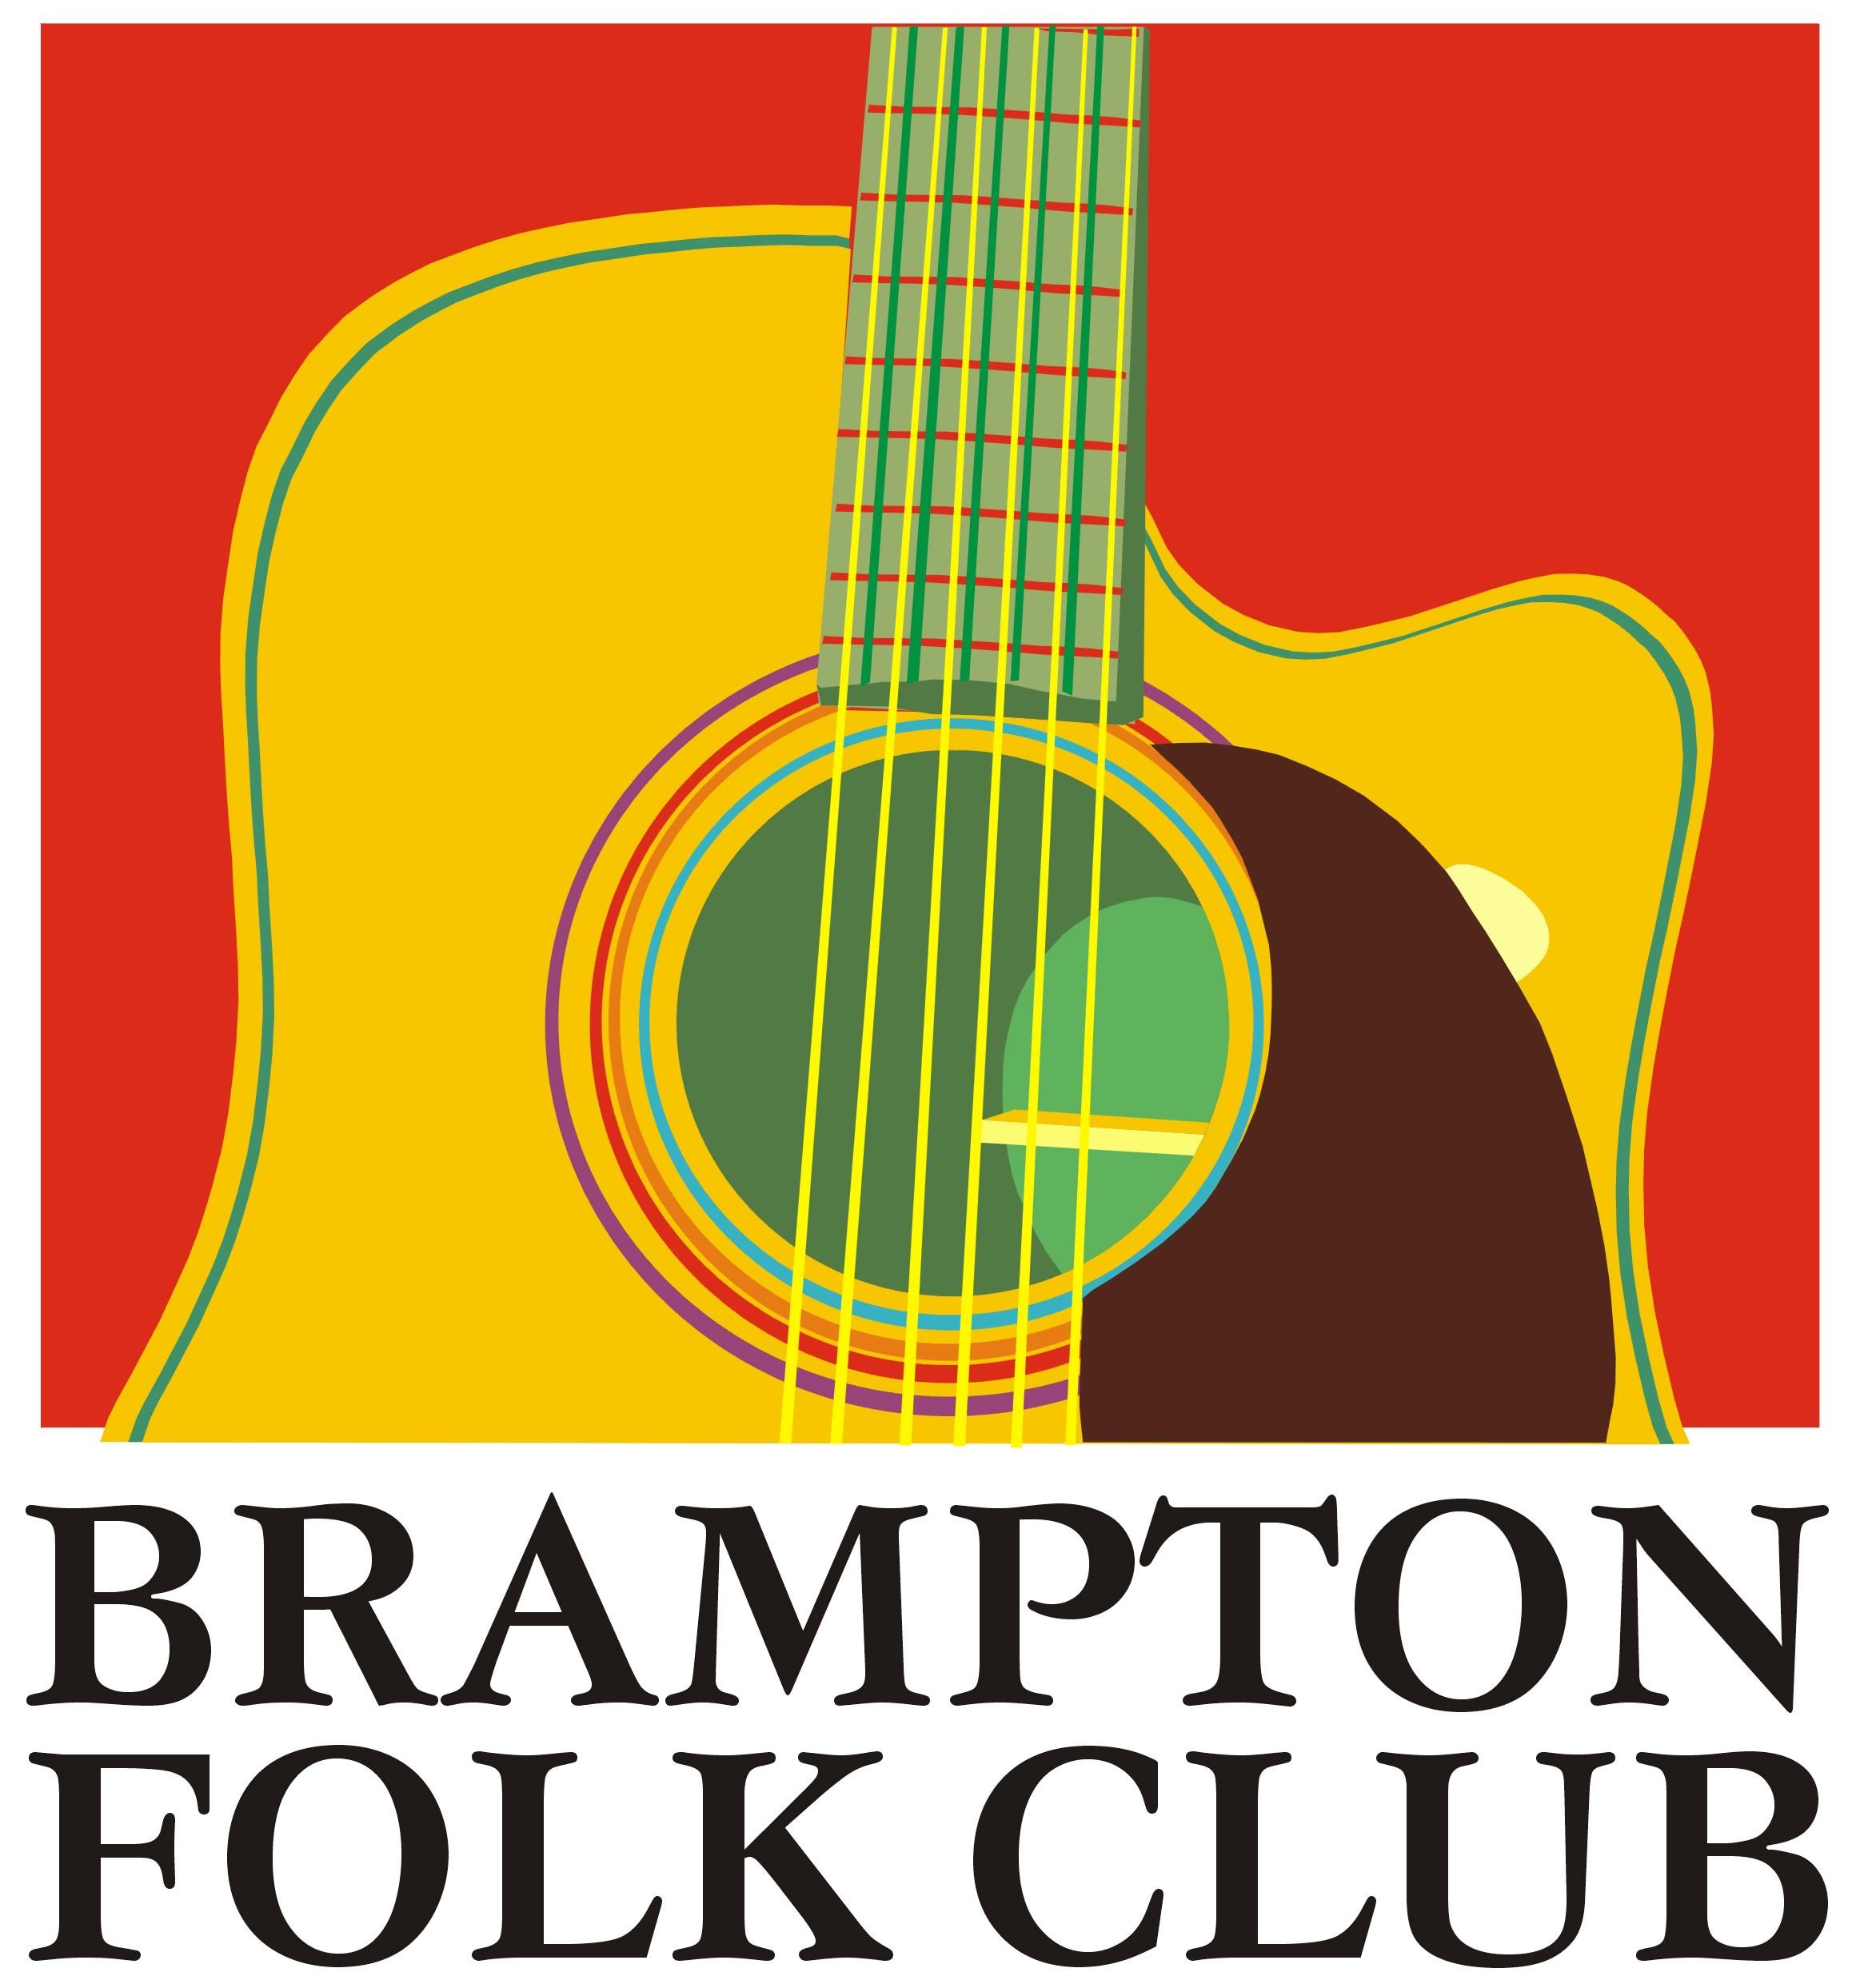 Brampton Folk Club logo